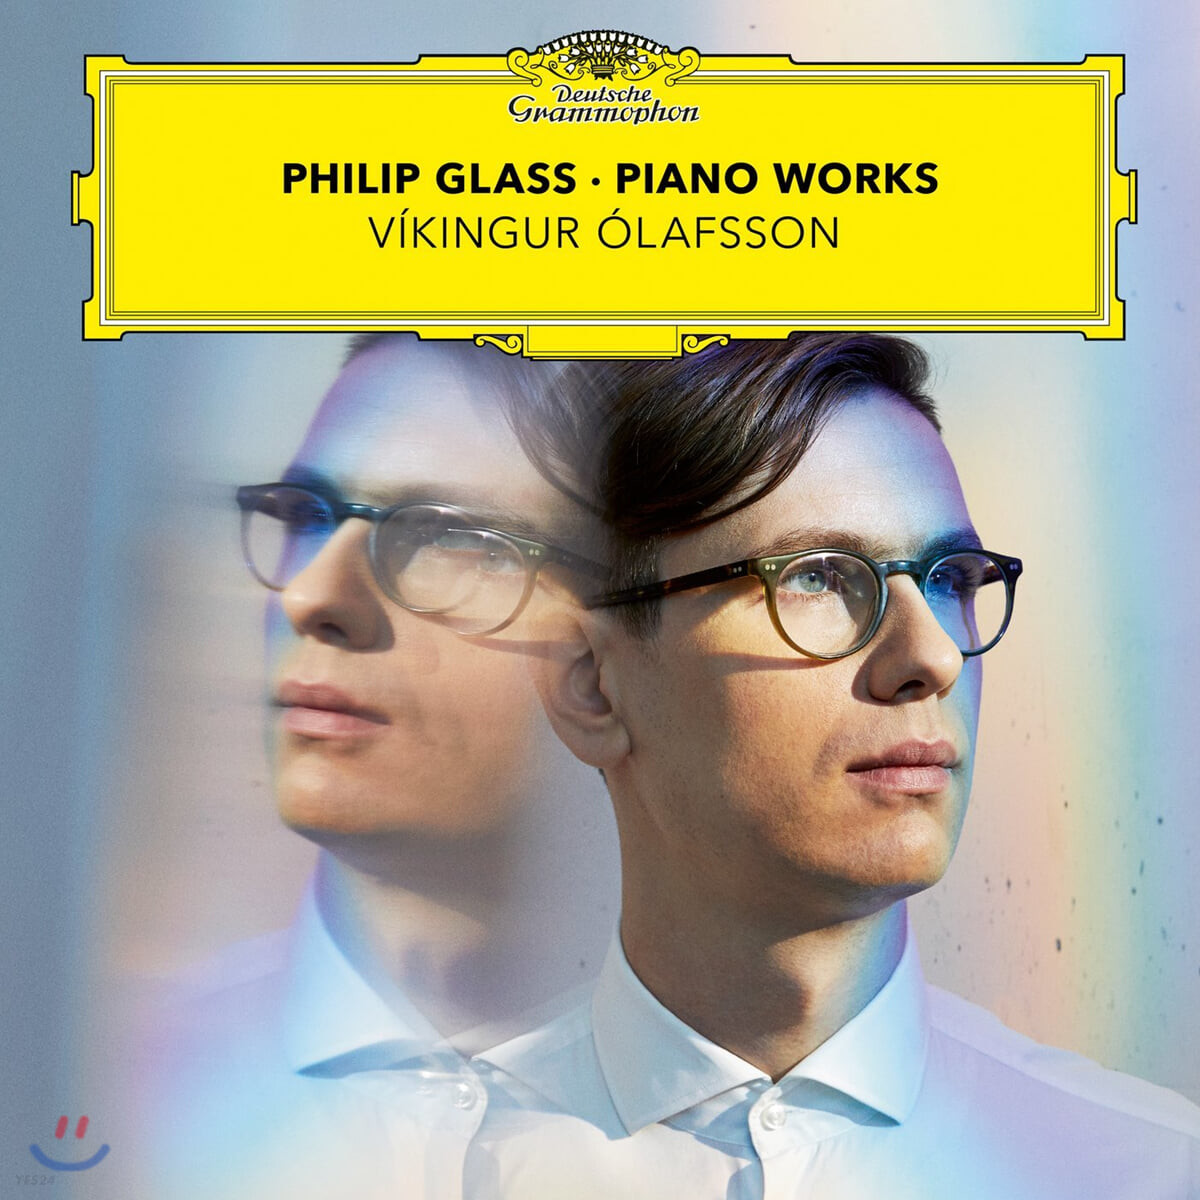 Vikingur Olafsson 필립 글래스: 피아노 작품집 - 비킹구르 올라프손 (Philip Glass: Piano Works) [2LP]